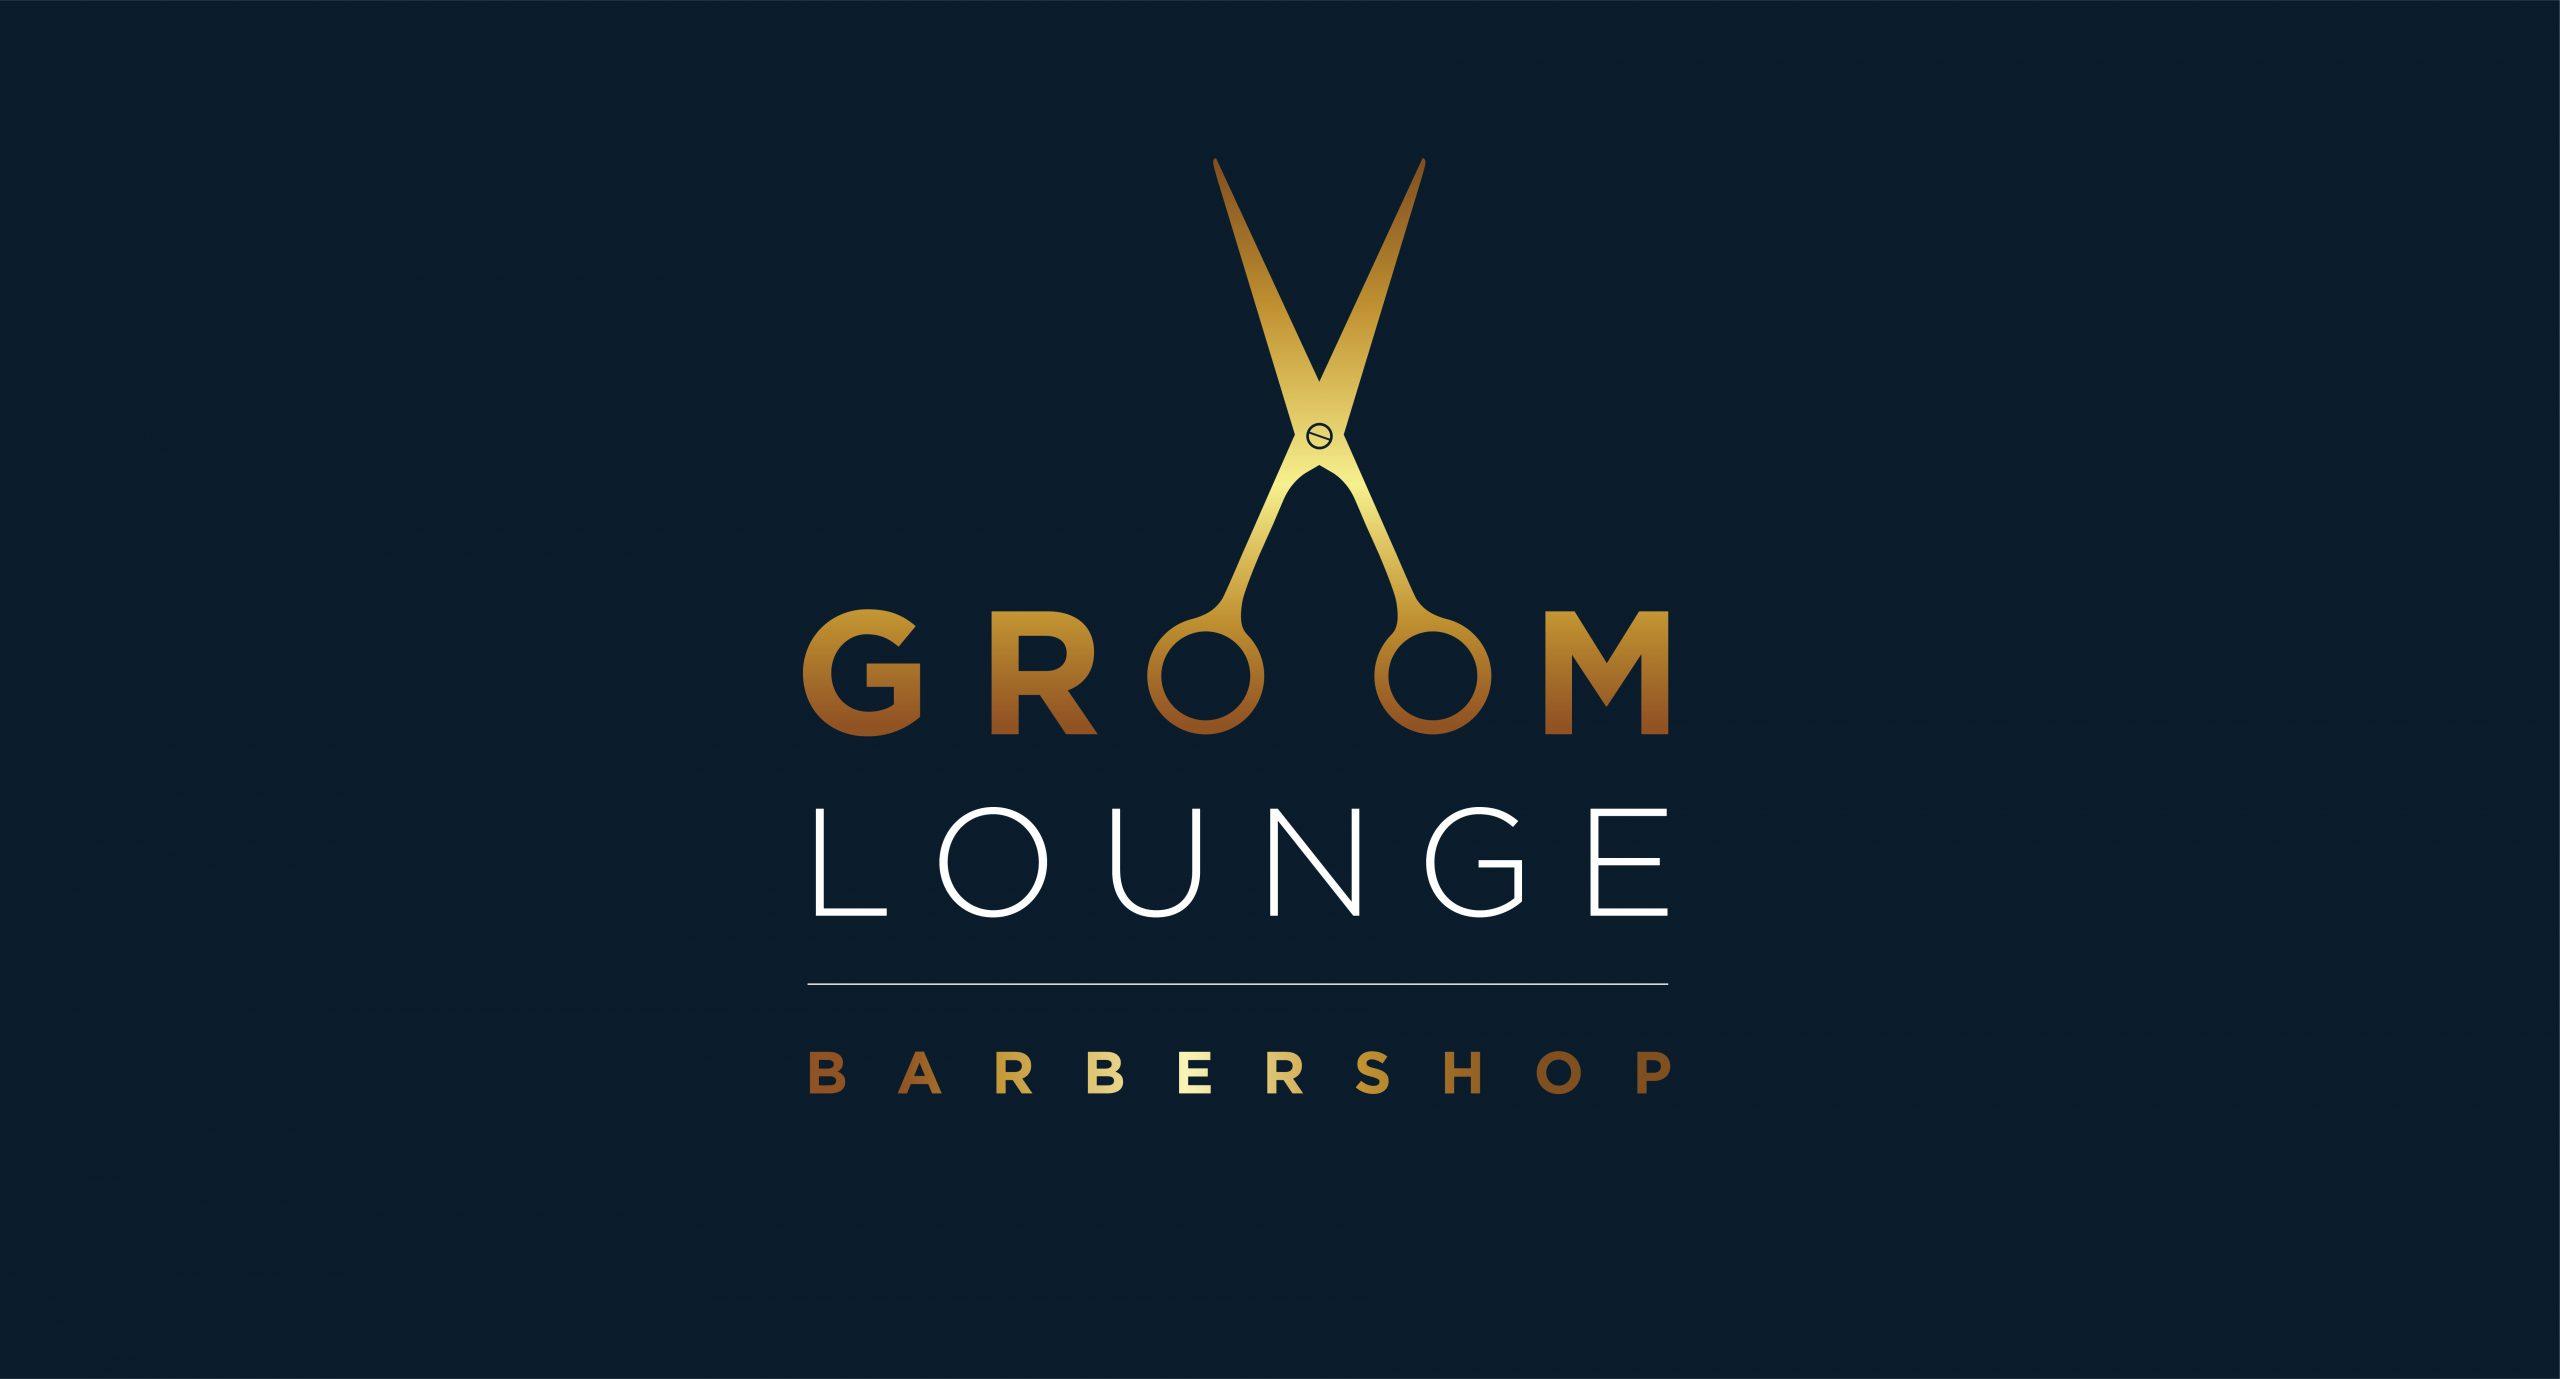 Groom Lounge